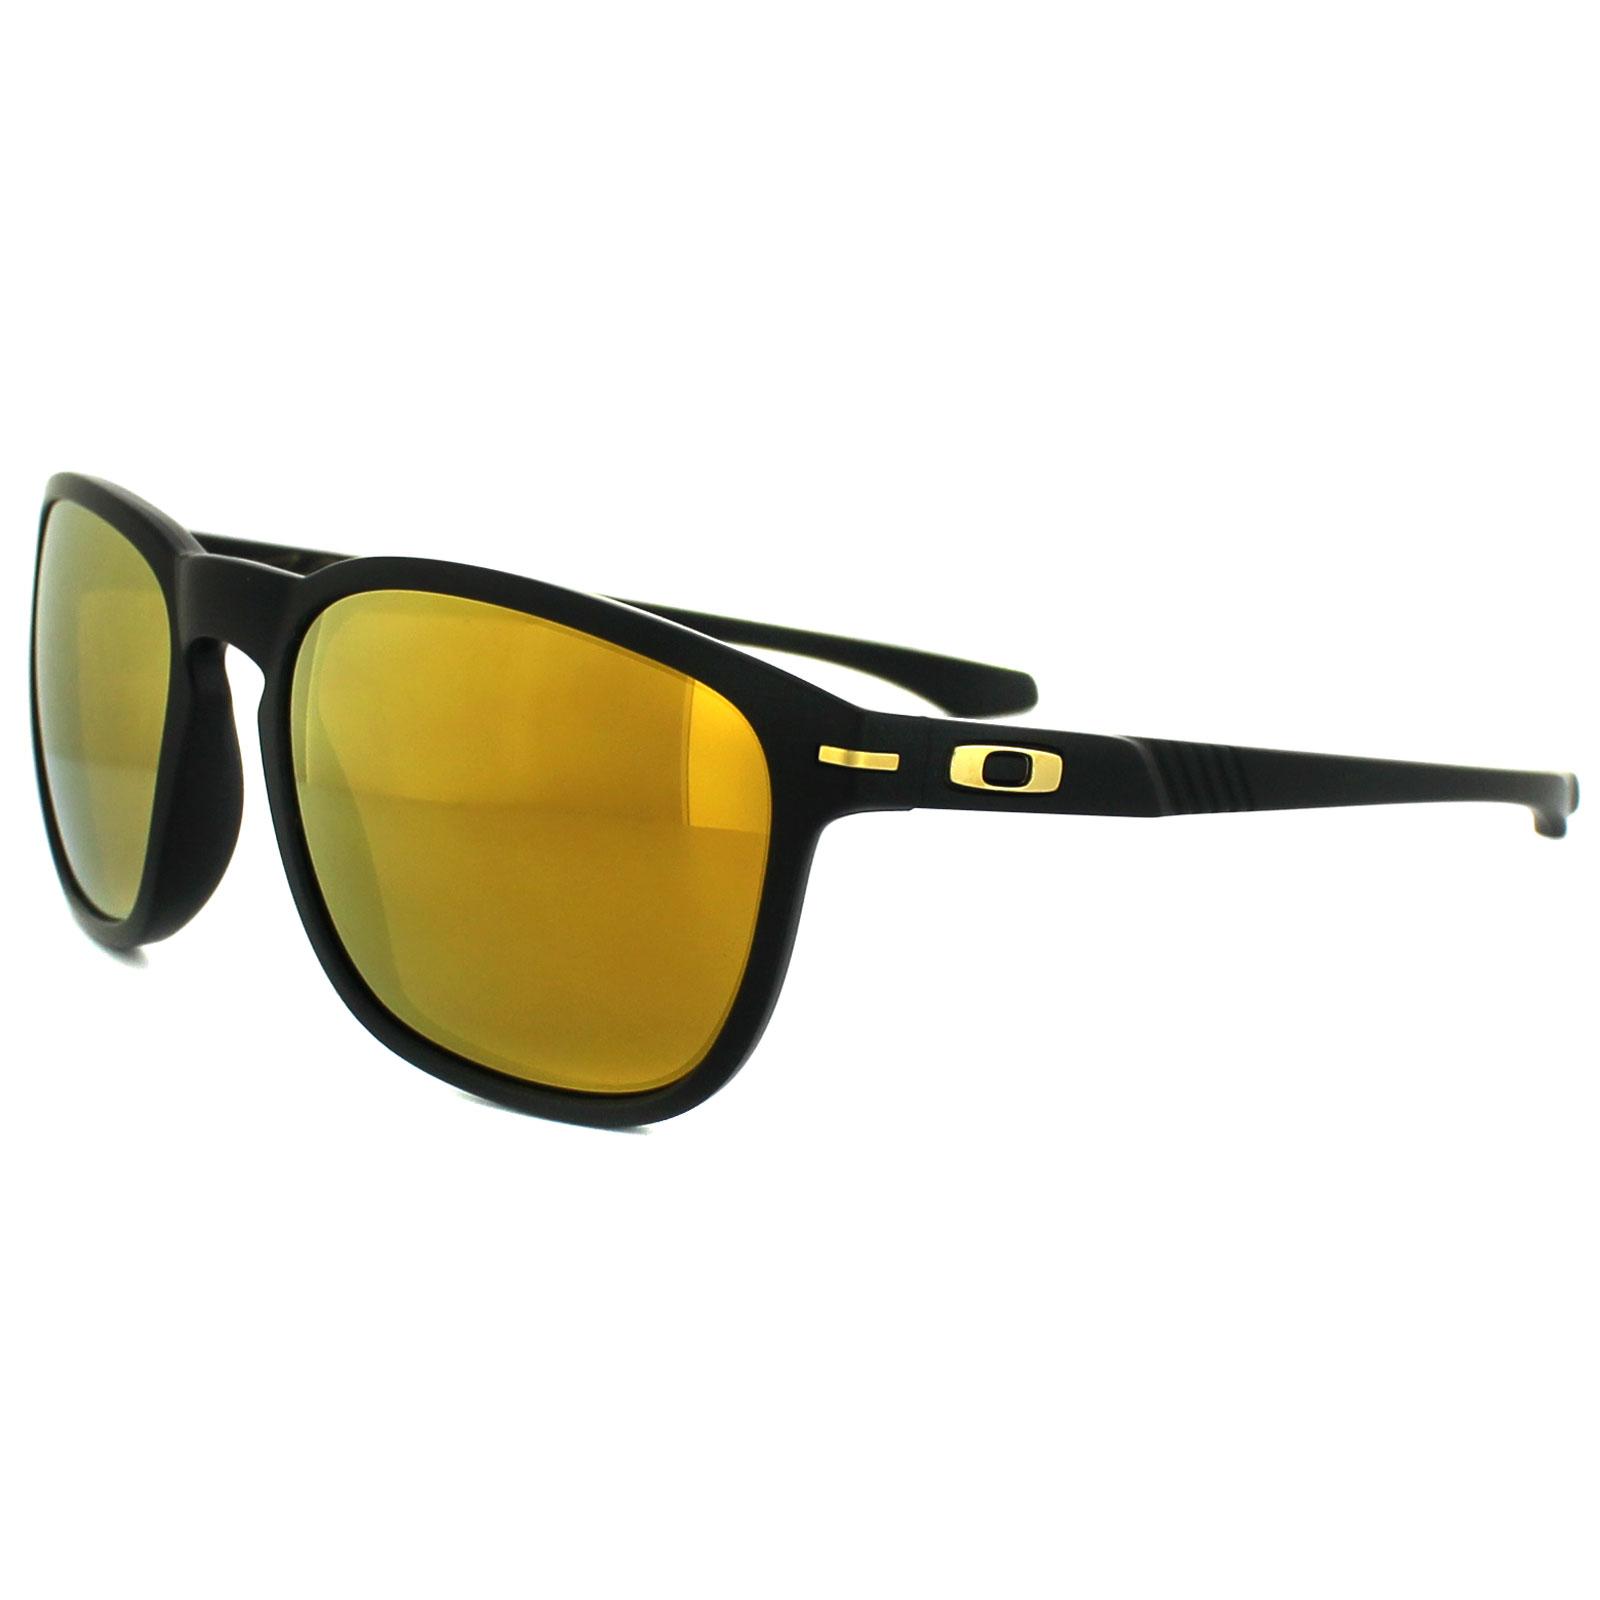 6d7b2172174 Oakley Sunglasses Uk Ebay